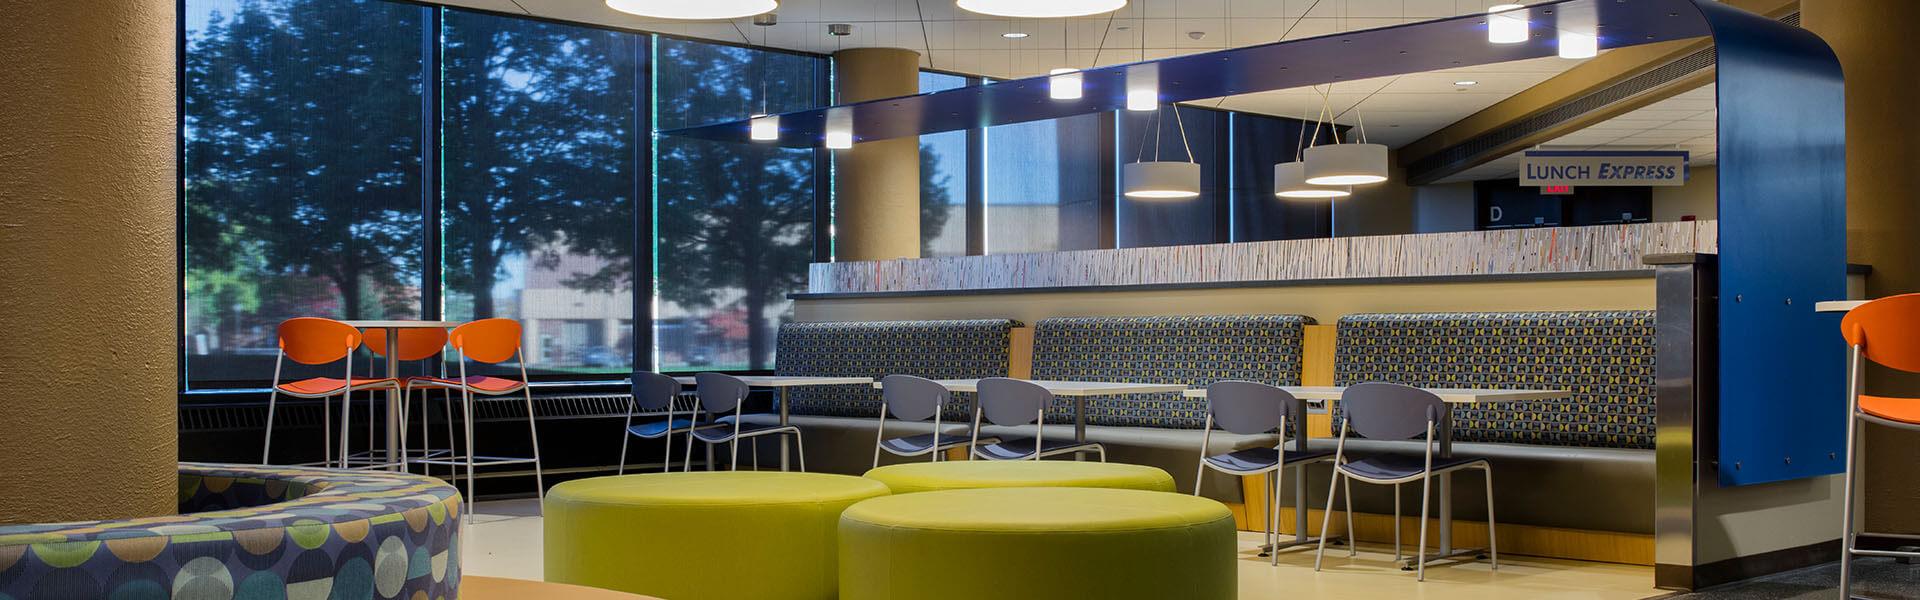 immel-banner_WITC - Student Services Center